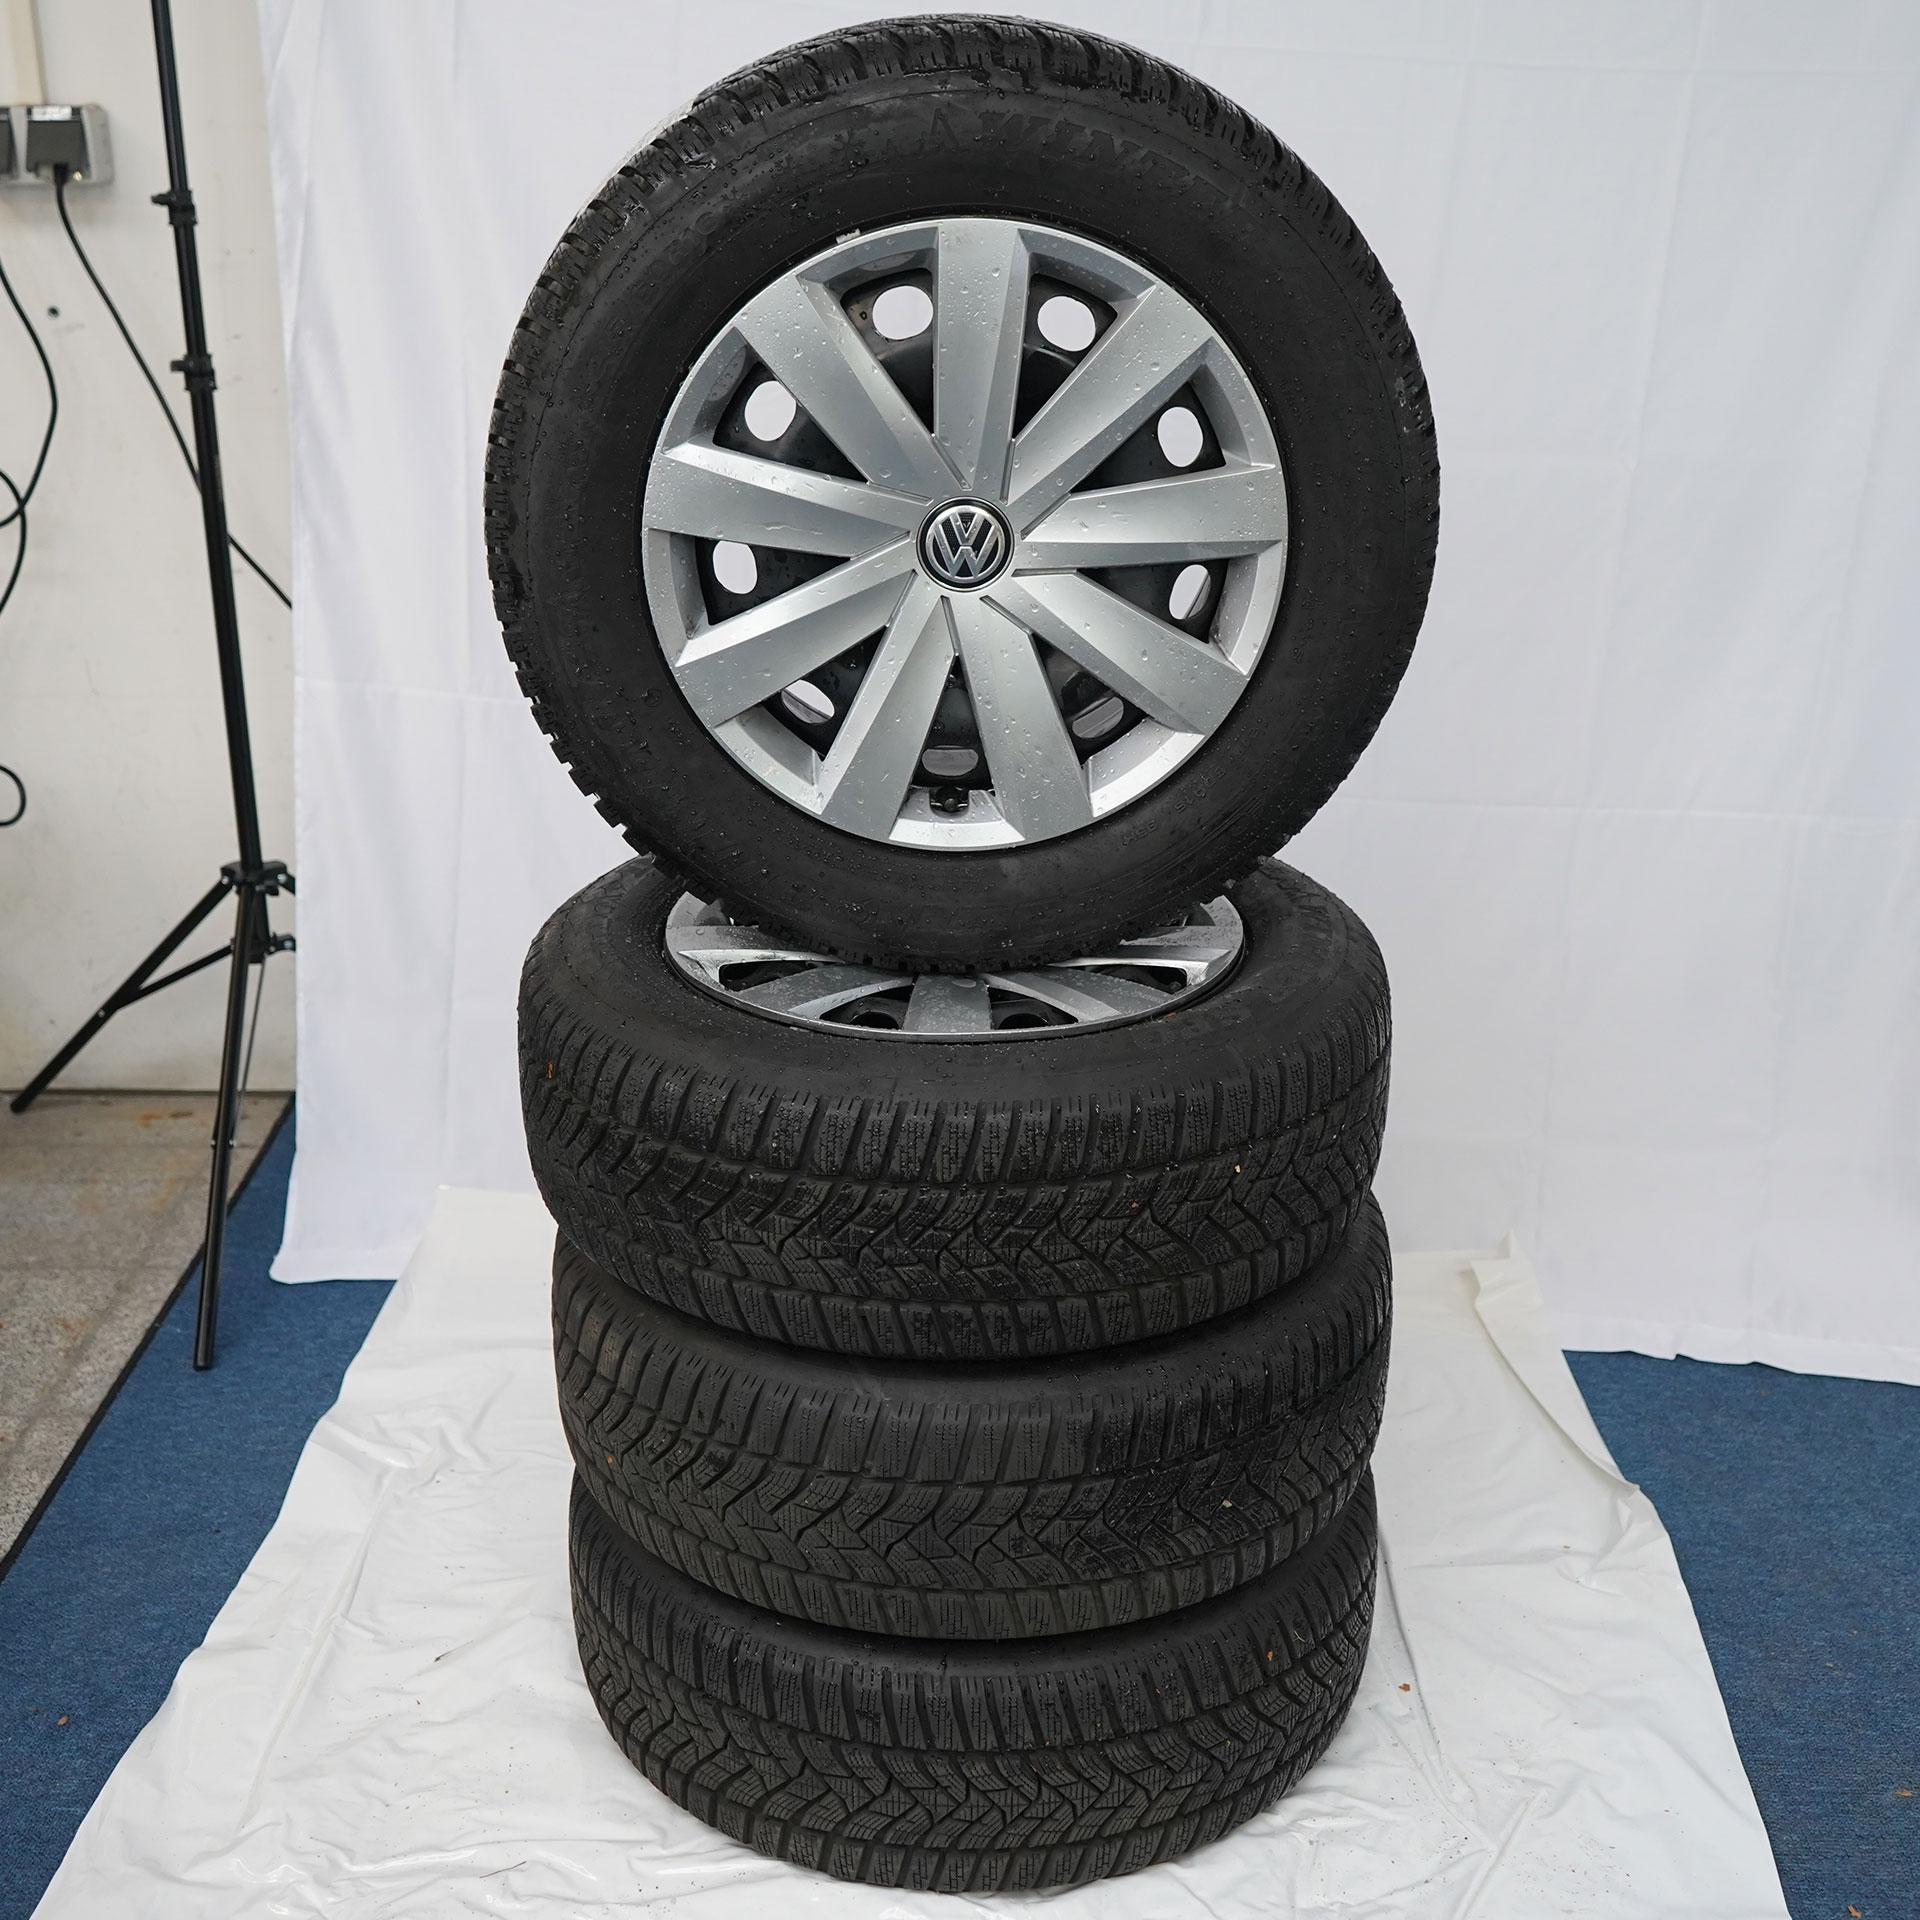 Gebrauchter 16 Zoll Original Volkswagen Winterkomplettrad-Satz VW Passat Dunlop